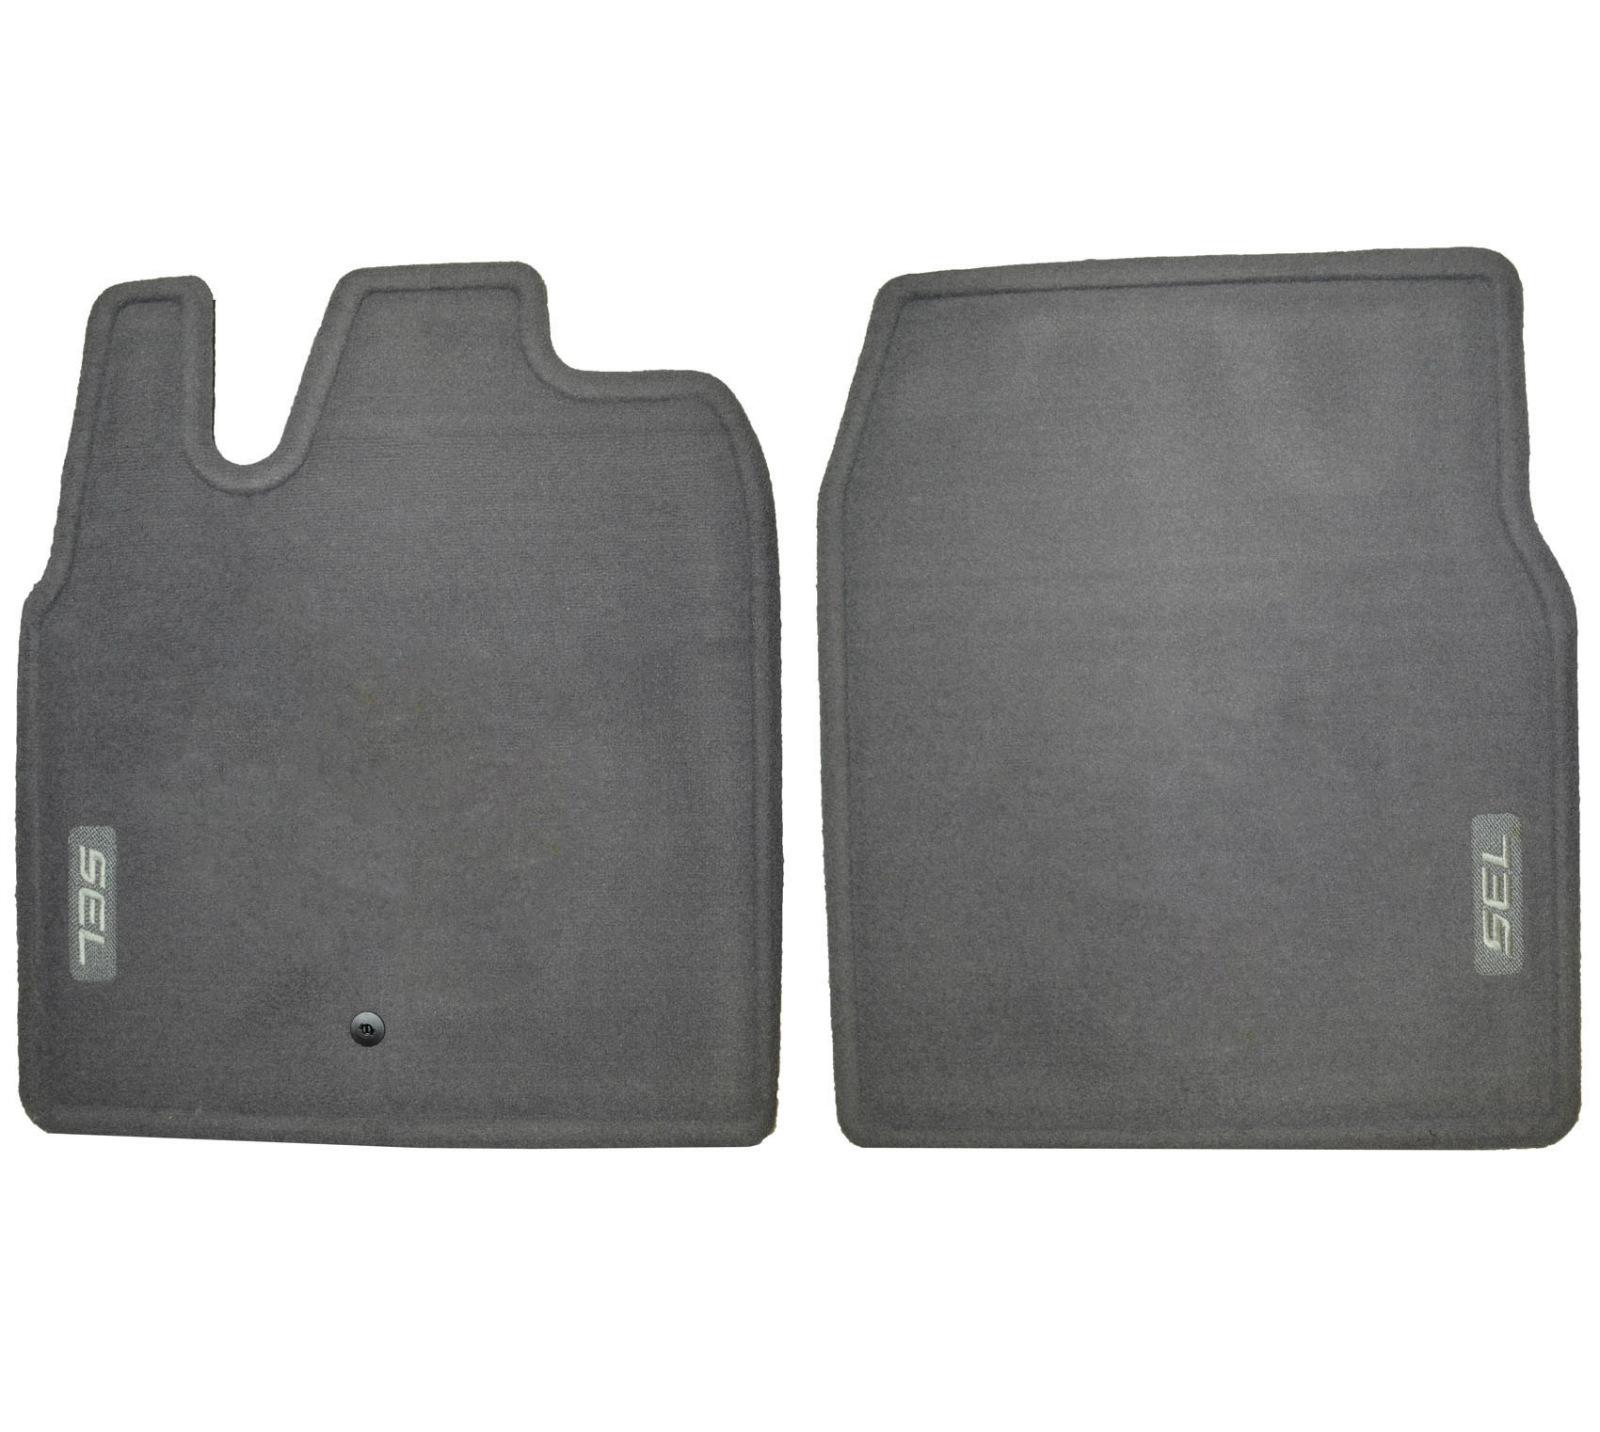 hight resolution of details about new ford windstar floor mats custom sel logo mini van med dk graphite gray grey